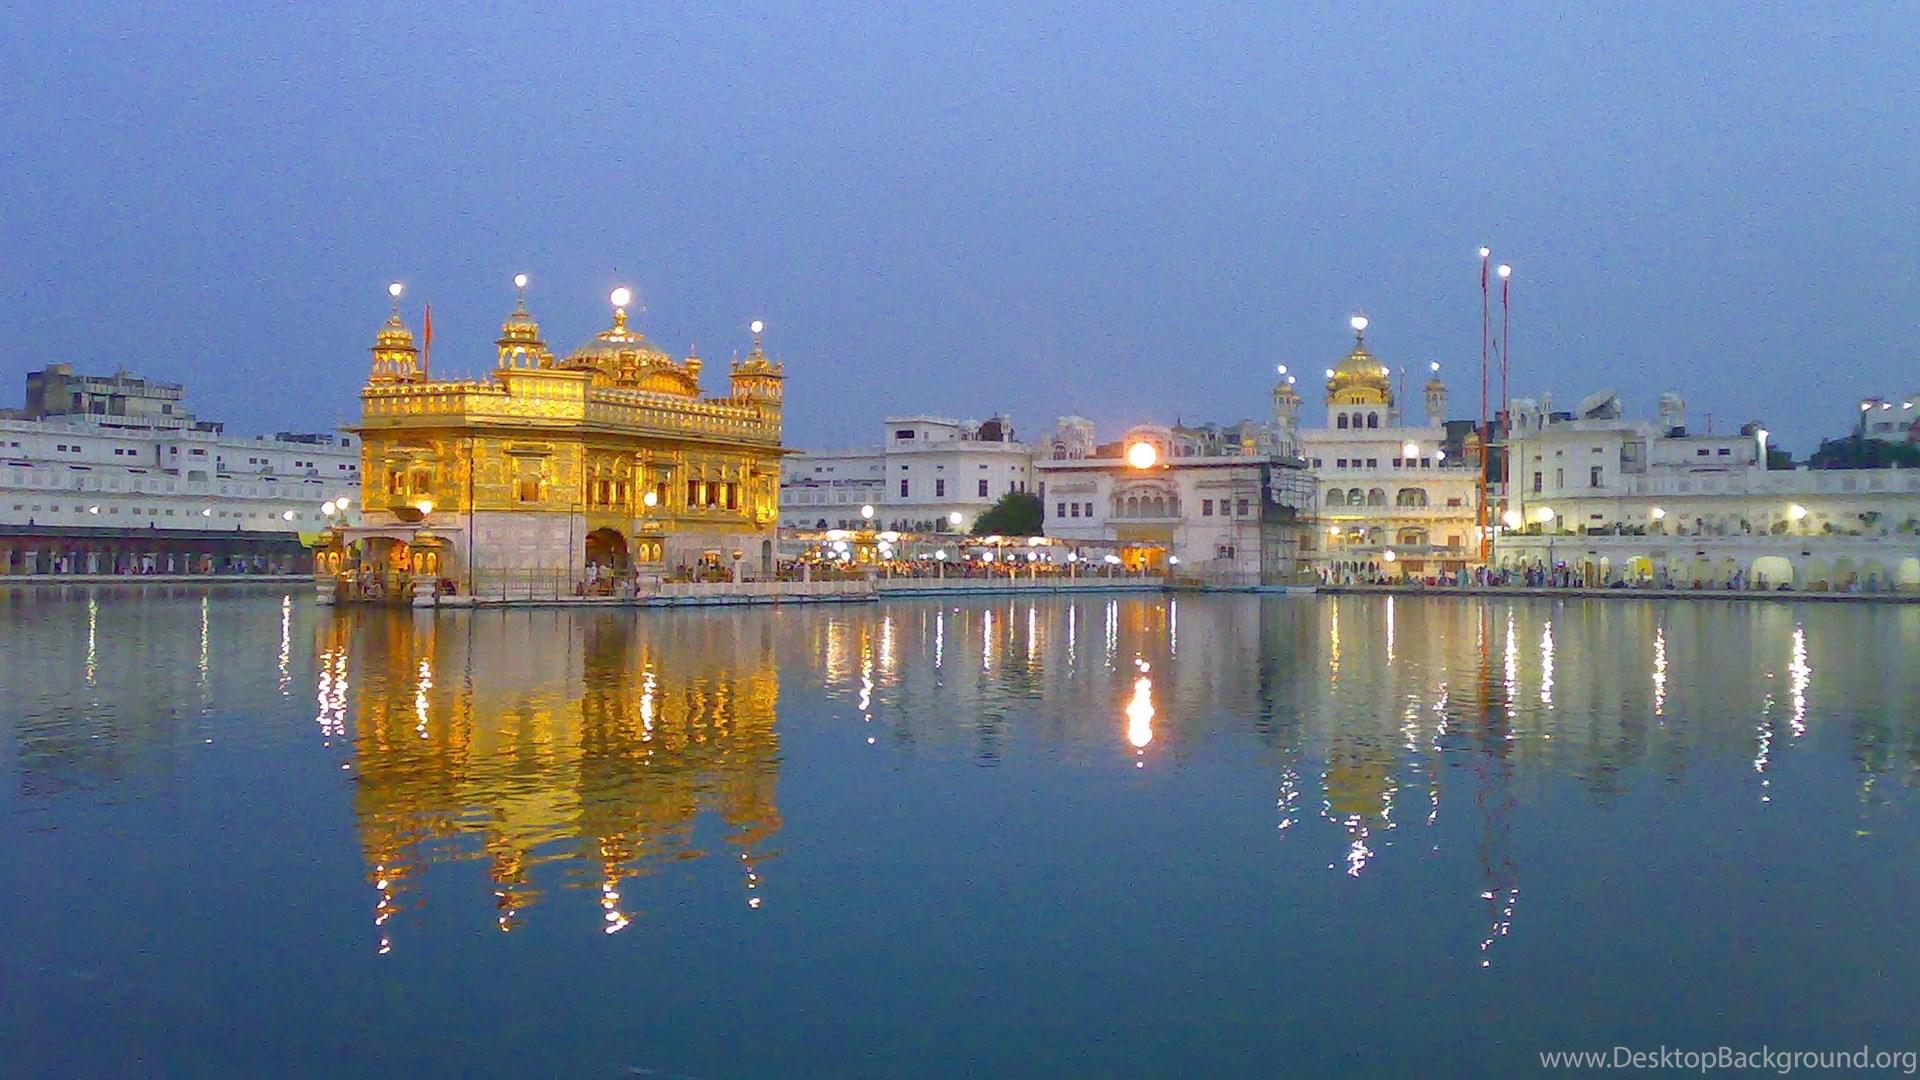 Popular Wallpaper High Resolution Sikh - 1035027_harmandir-sahib-wallpapers-wallpapers-zone_2048x1536_h  Collection_327010.jpg